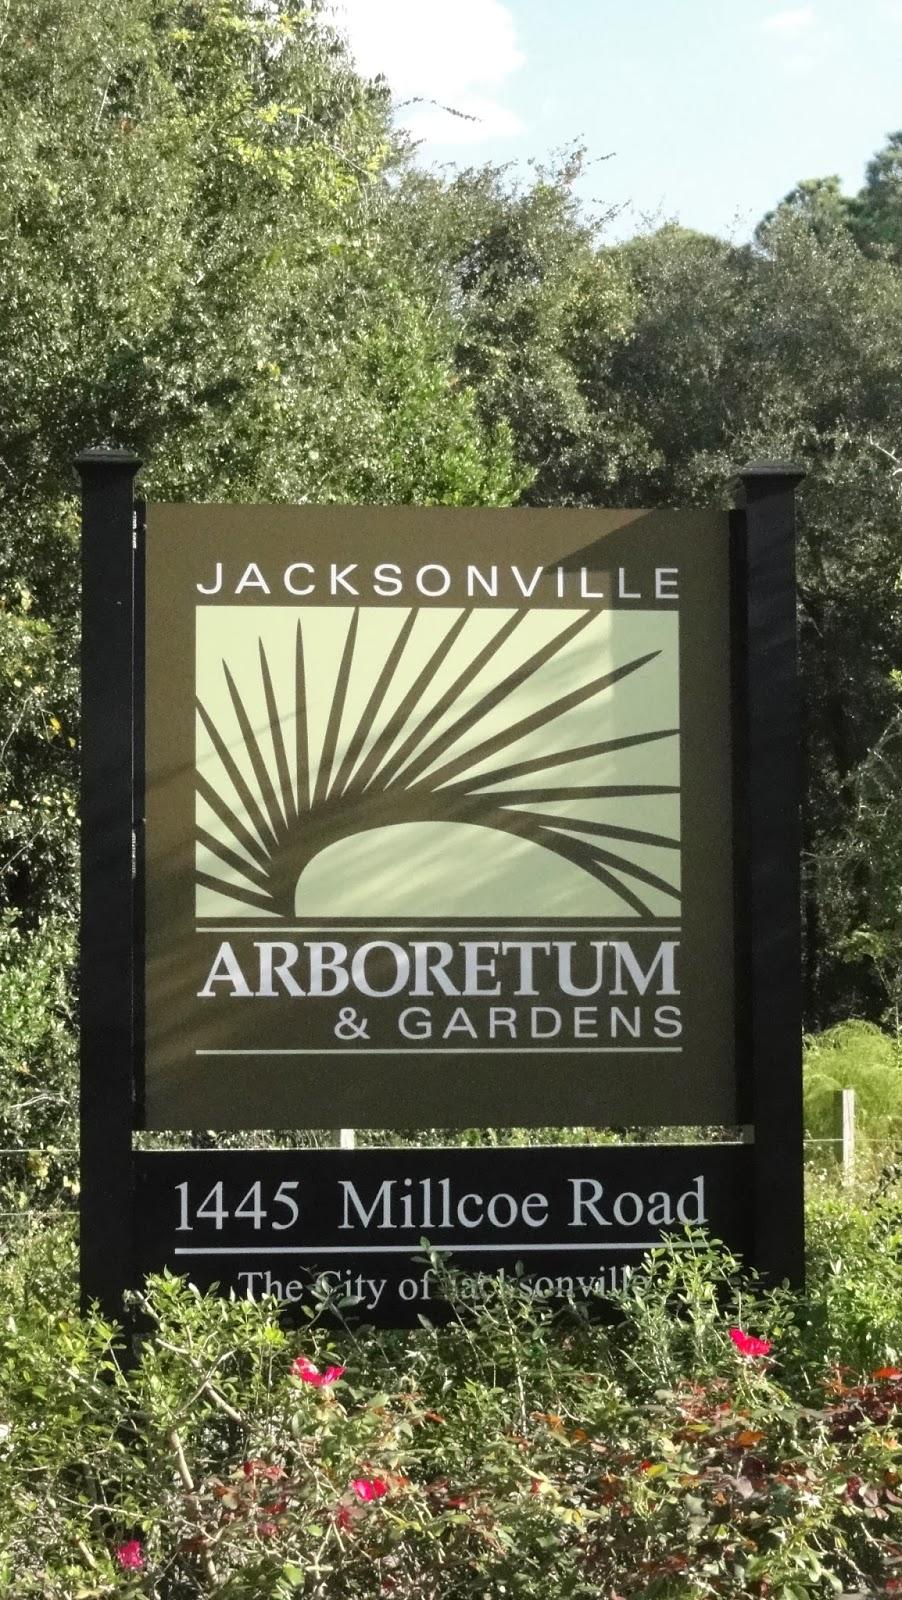 Gogardennow the jacksonville arboretum and gardens florida - Jacksonville arboretum and gardens ...